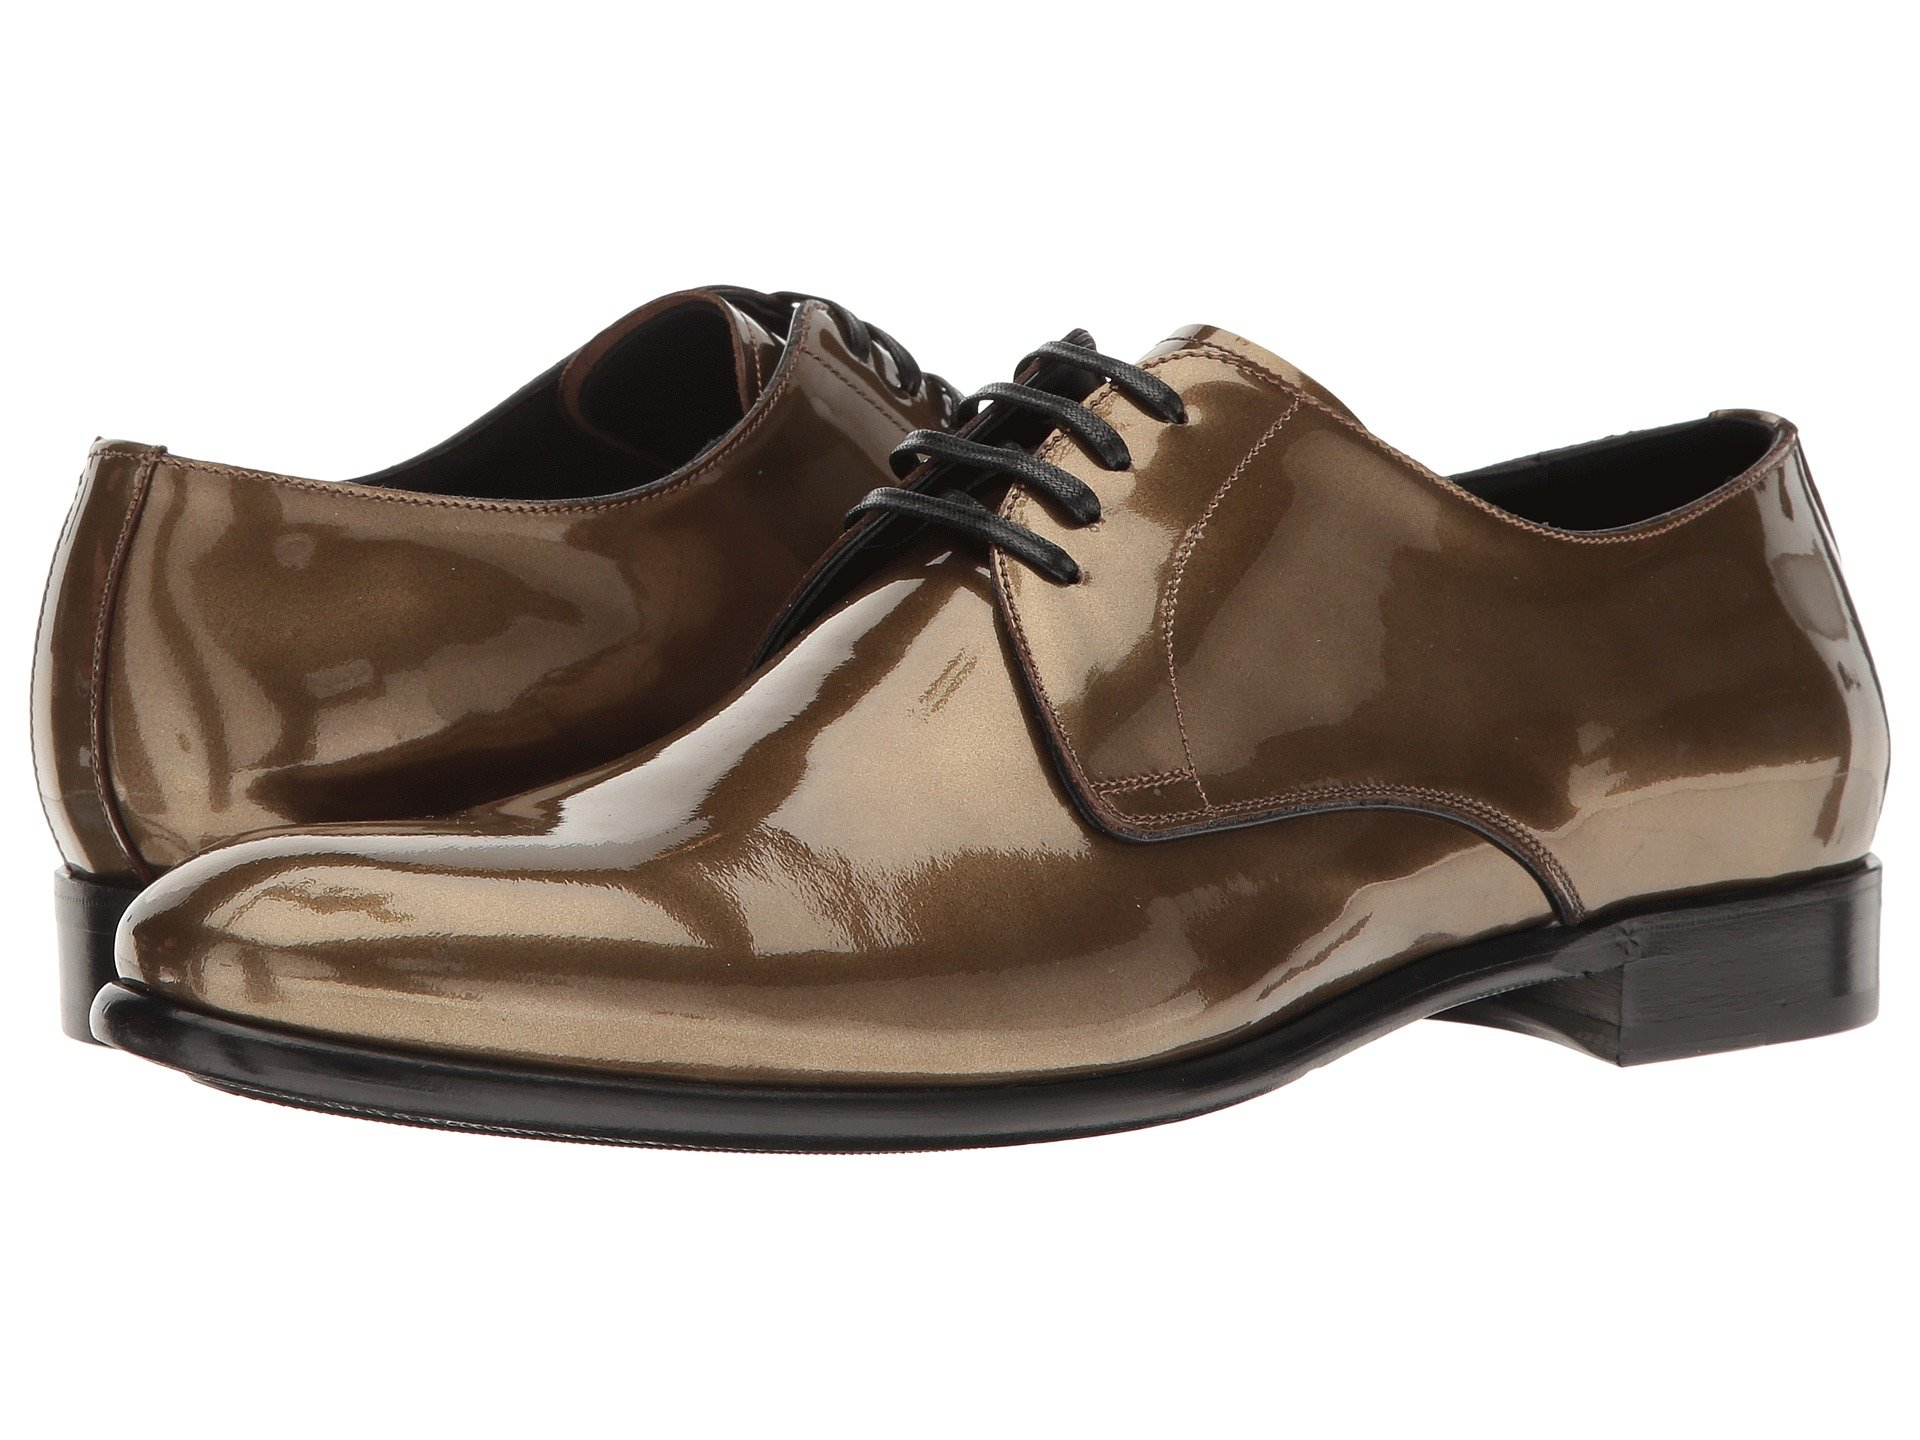 Dolce & Gabbana Metallic Plain Toe Oxford qw3gEln